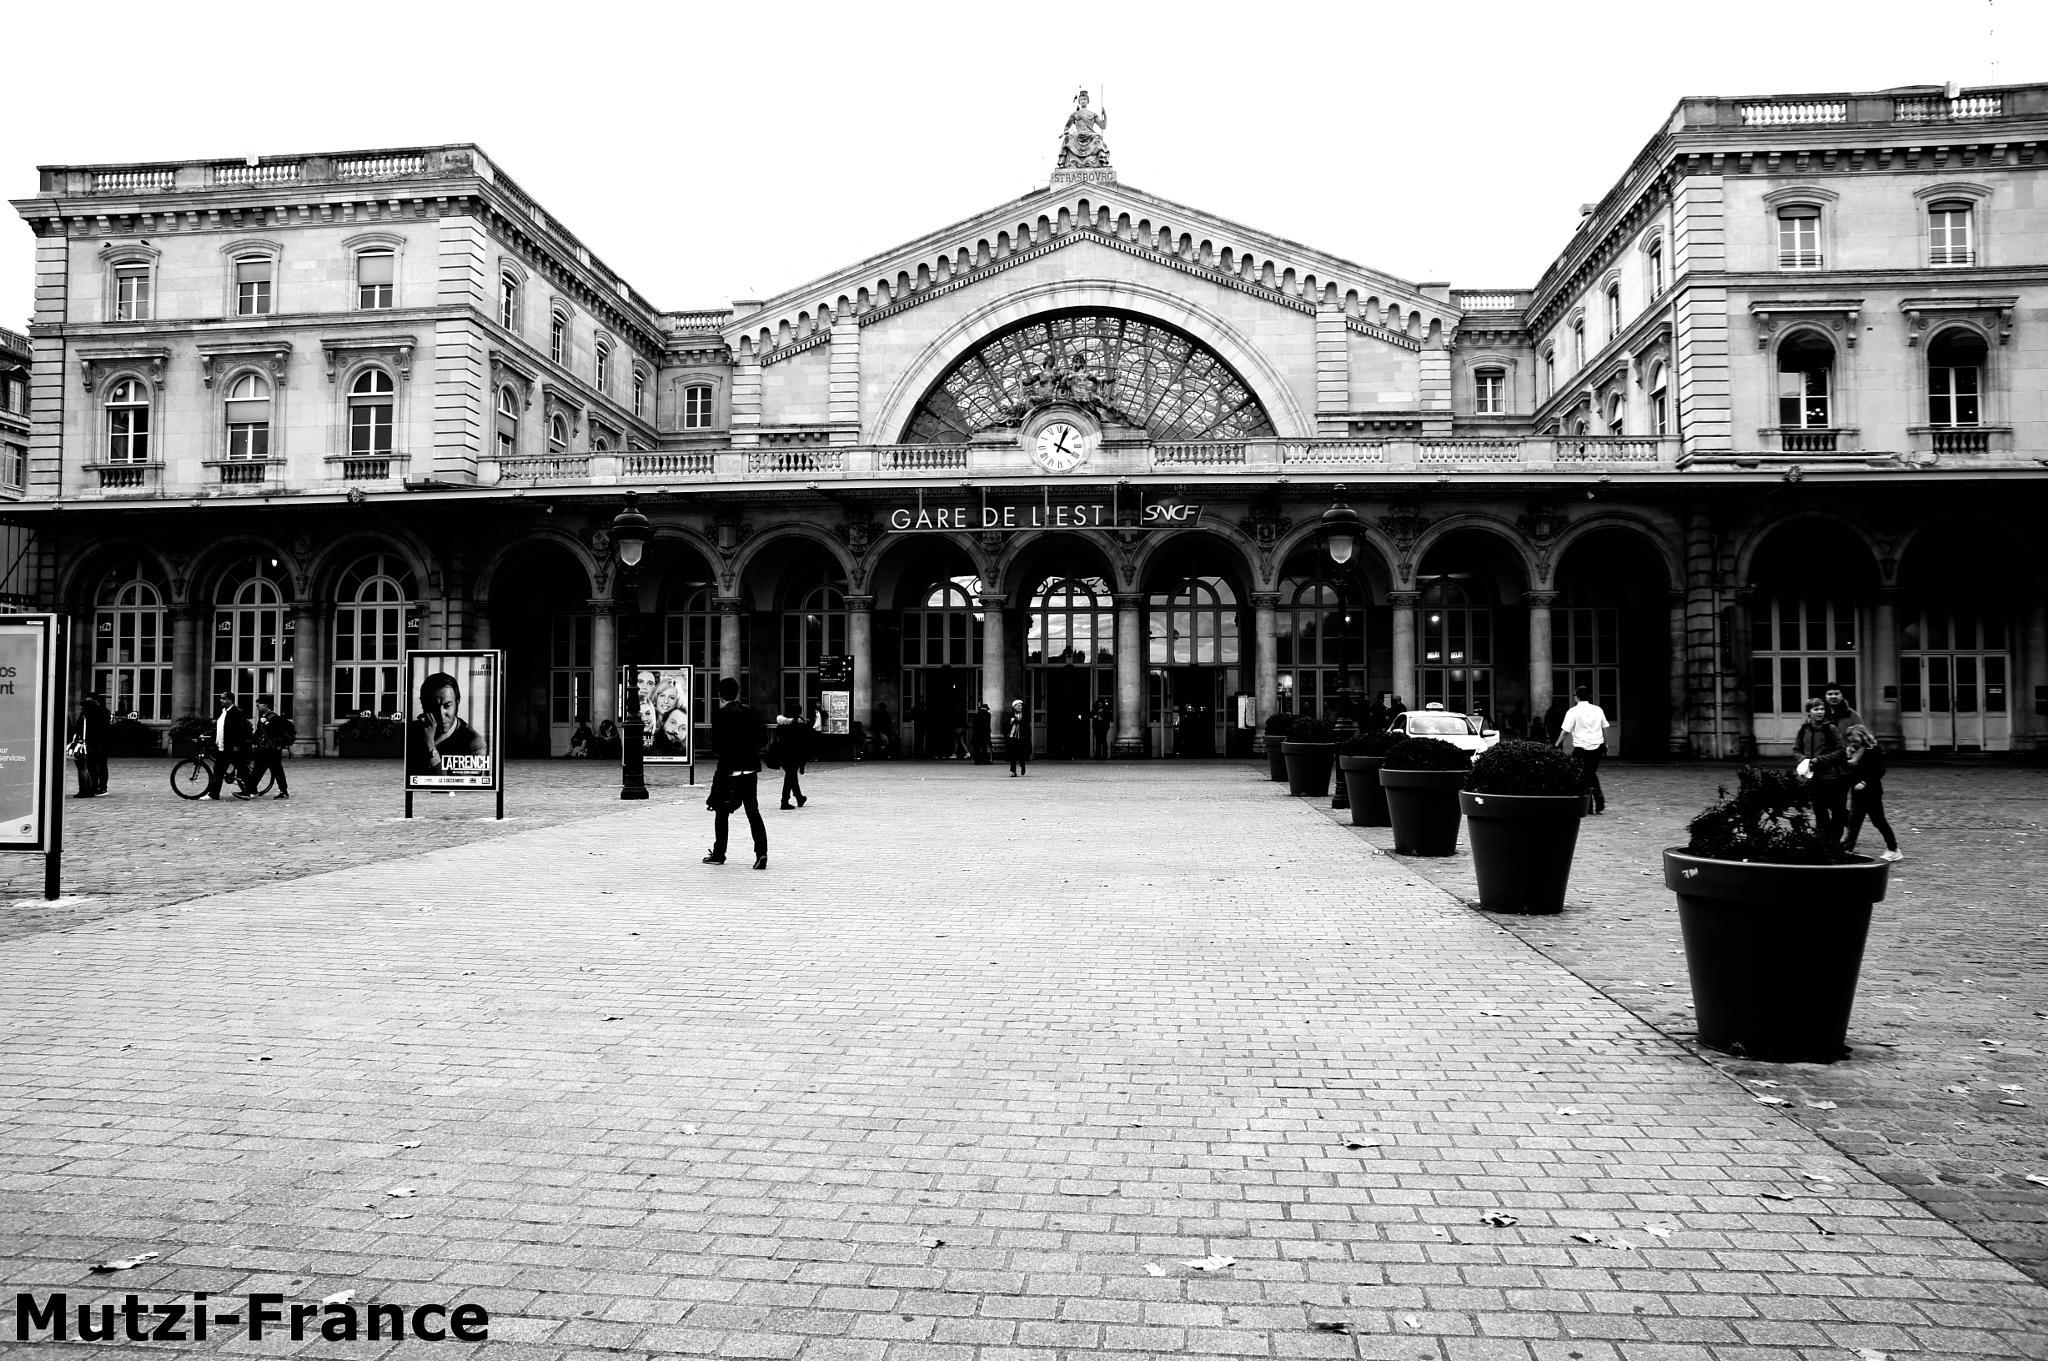 Gare del Est Paris ! by hanspeterfassmann